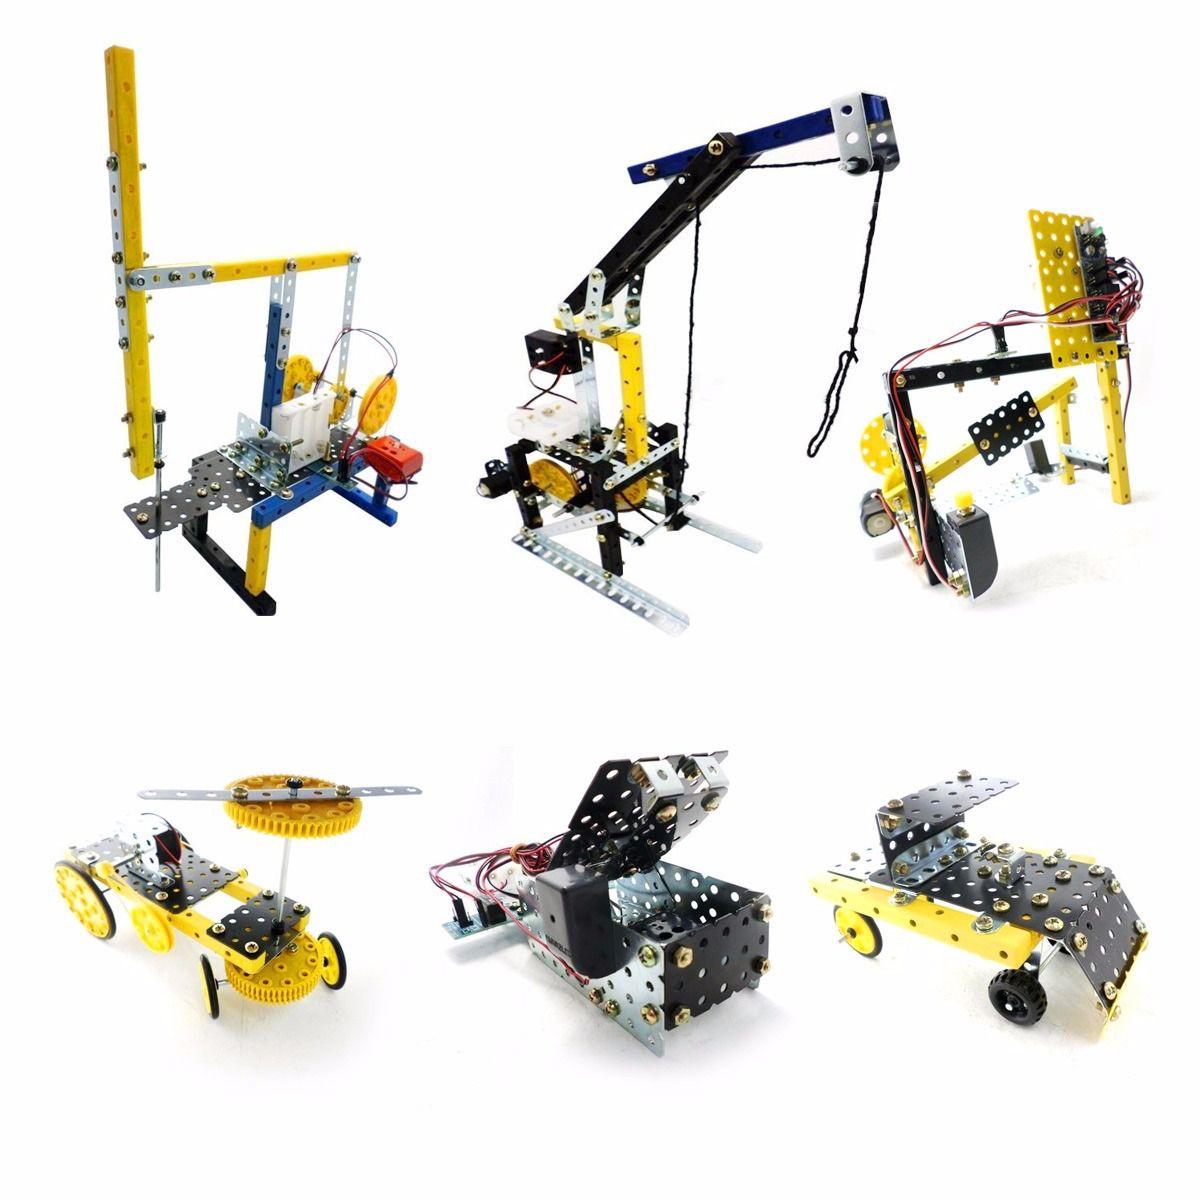 ILOG-F3 Modelix Robotics